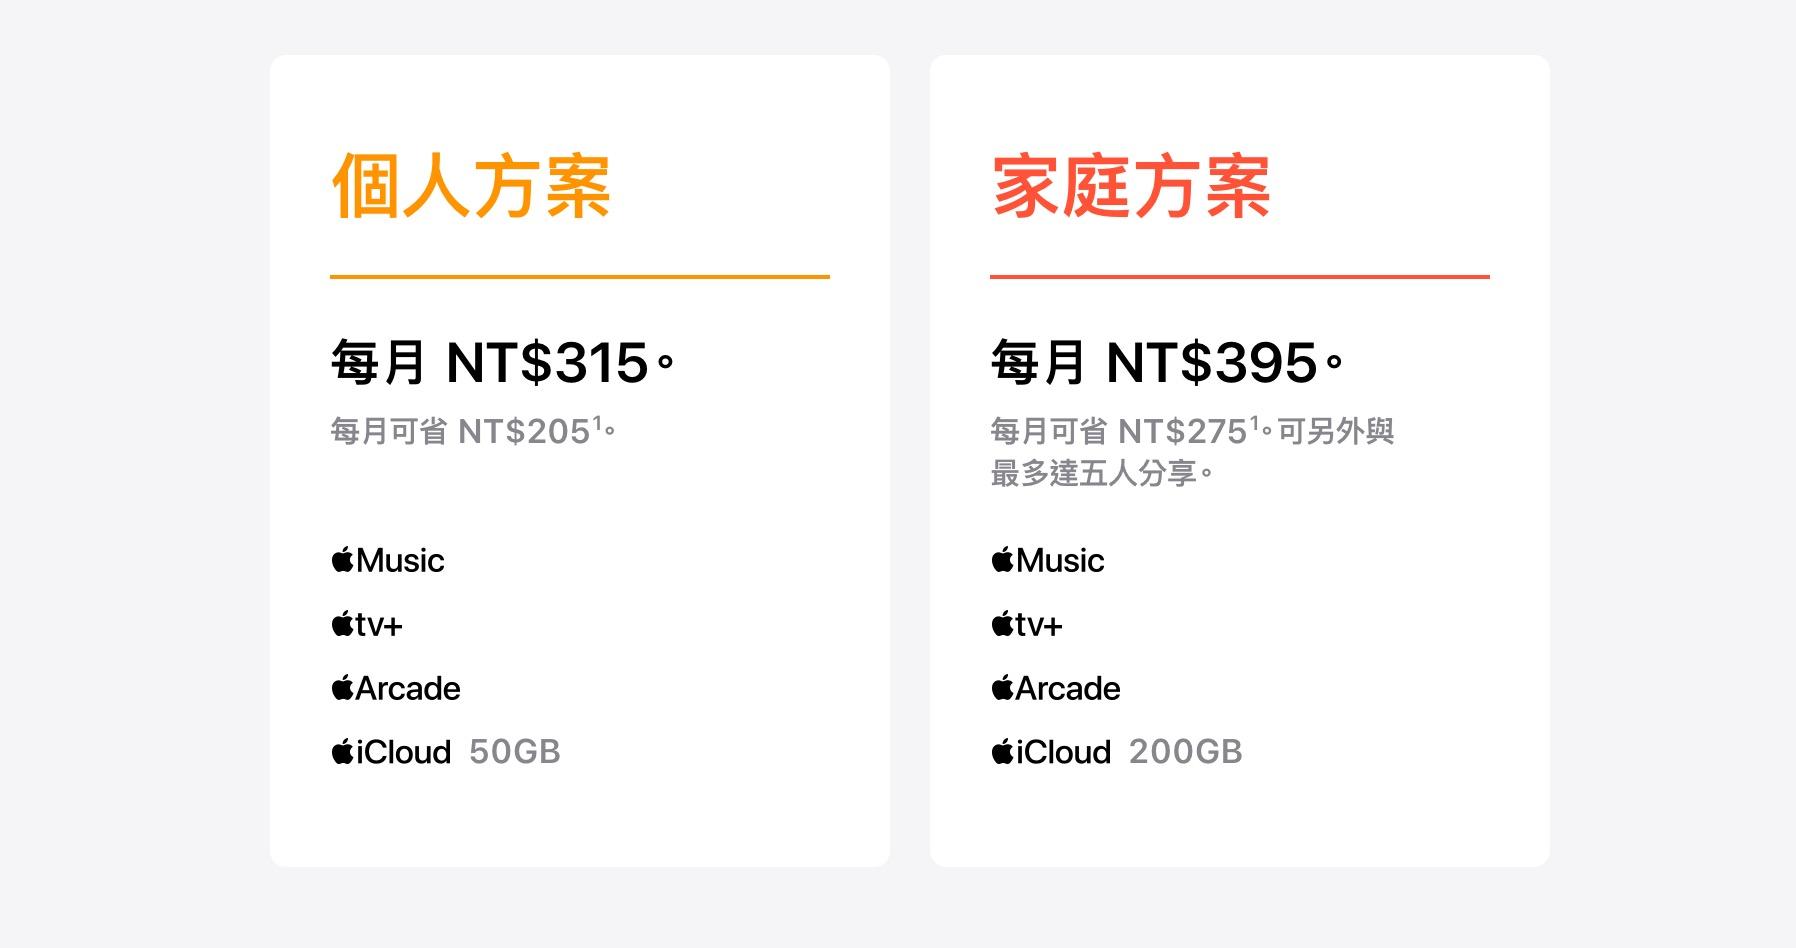 CleanShot 2020-09-16 at 13.22.56@2x.jpg